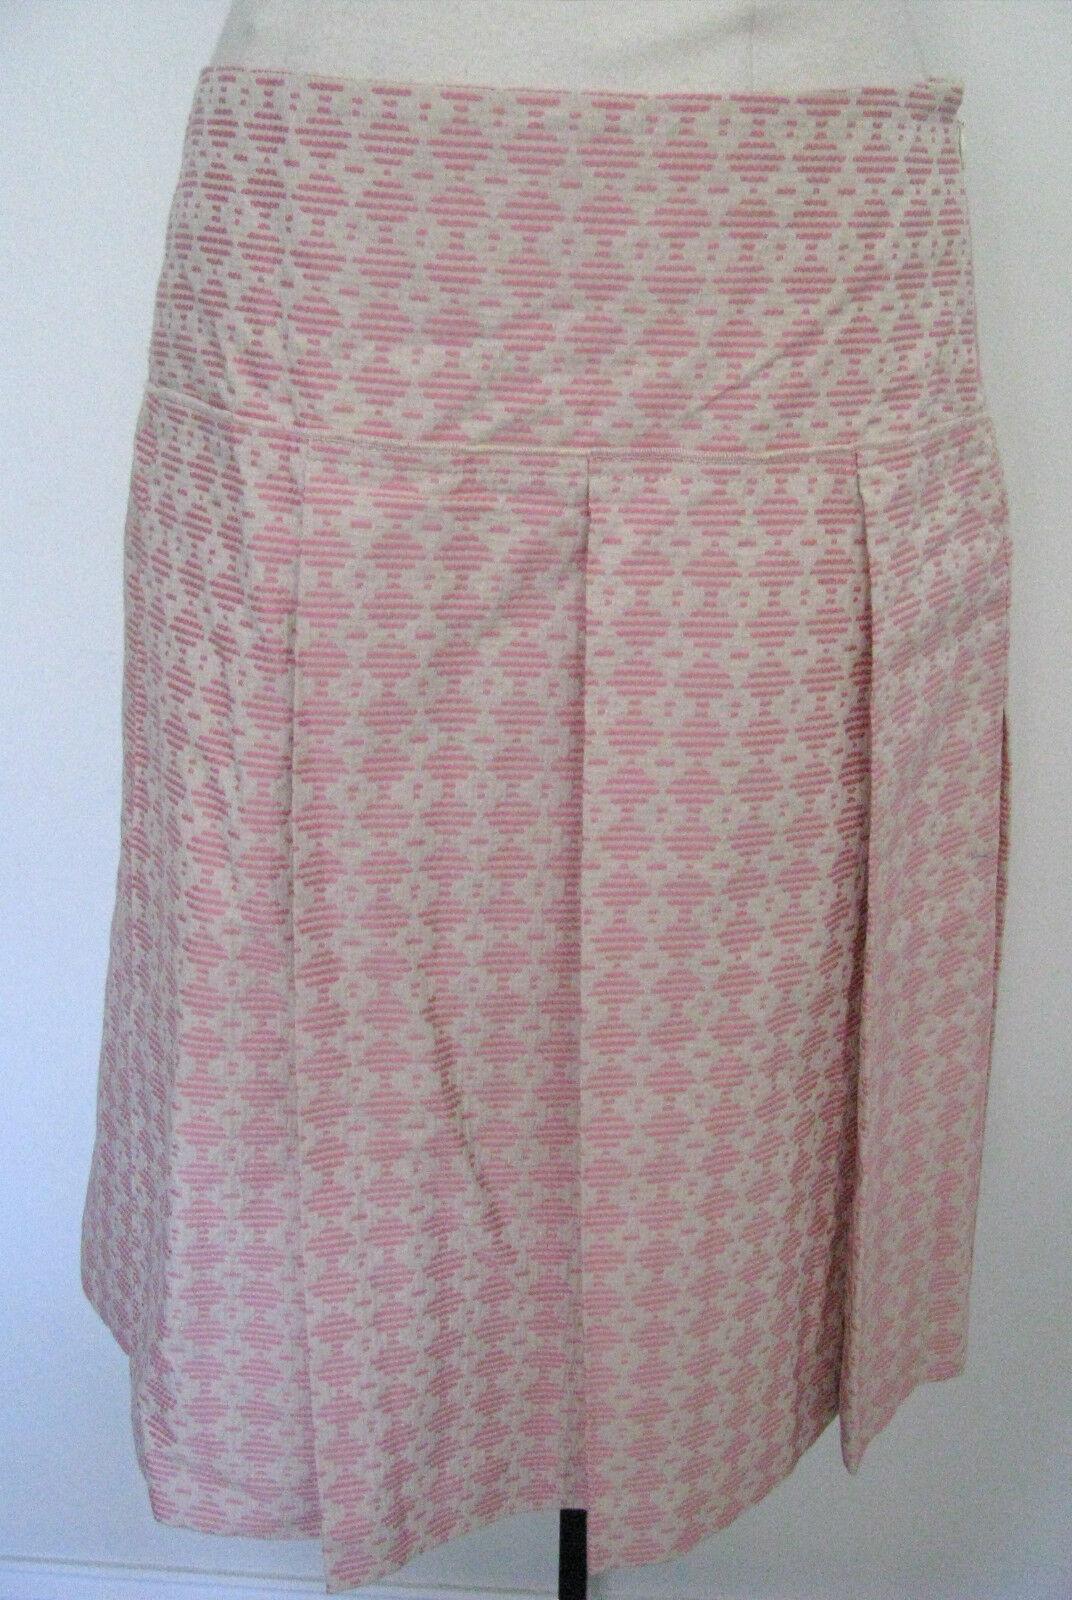 BCBG MAXAZRIA Cream With Pink Design 100% Cotton Skirt Size 4,NWT,  210.00